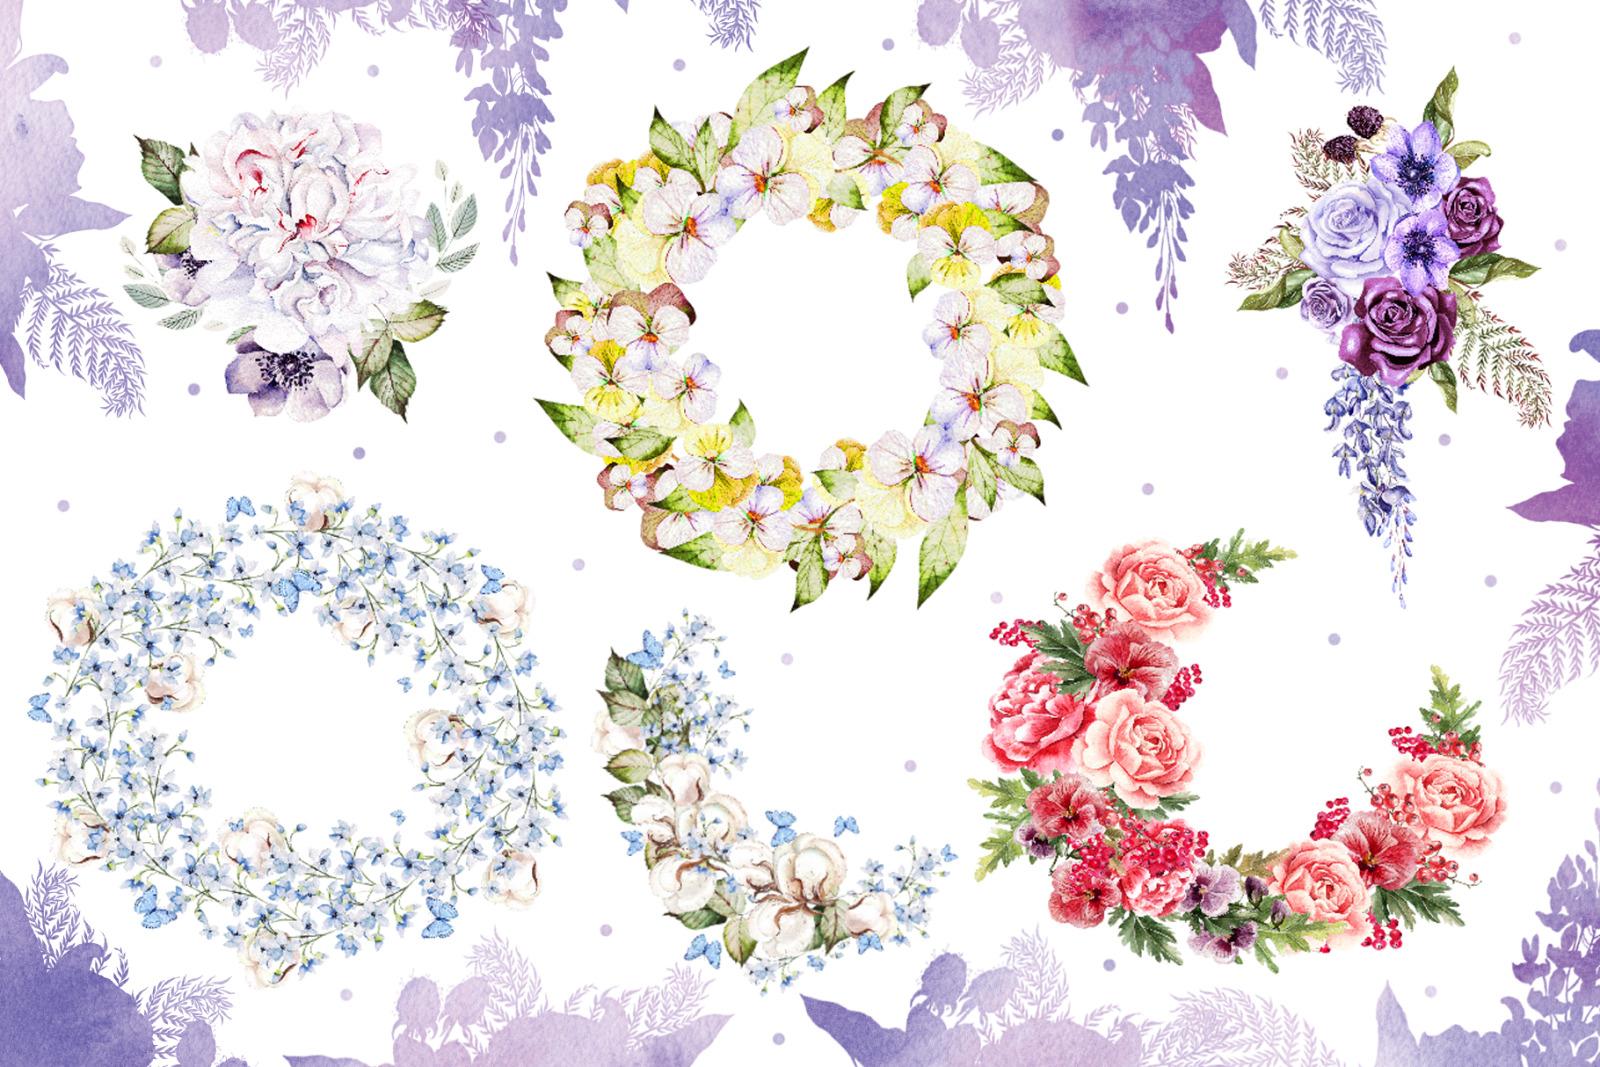 53 Watercolor Wreath & Bouquets